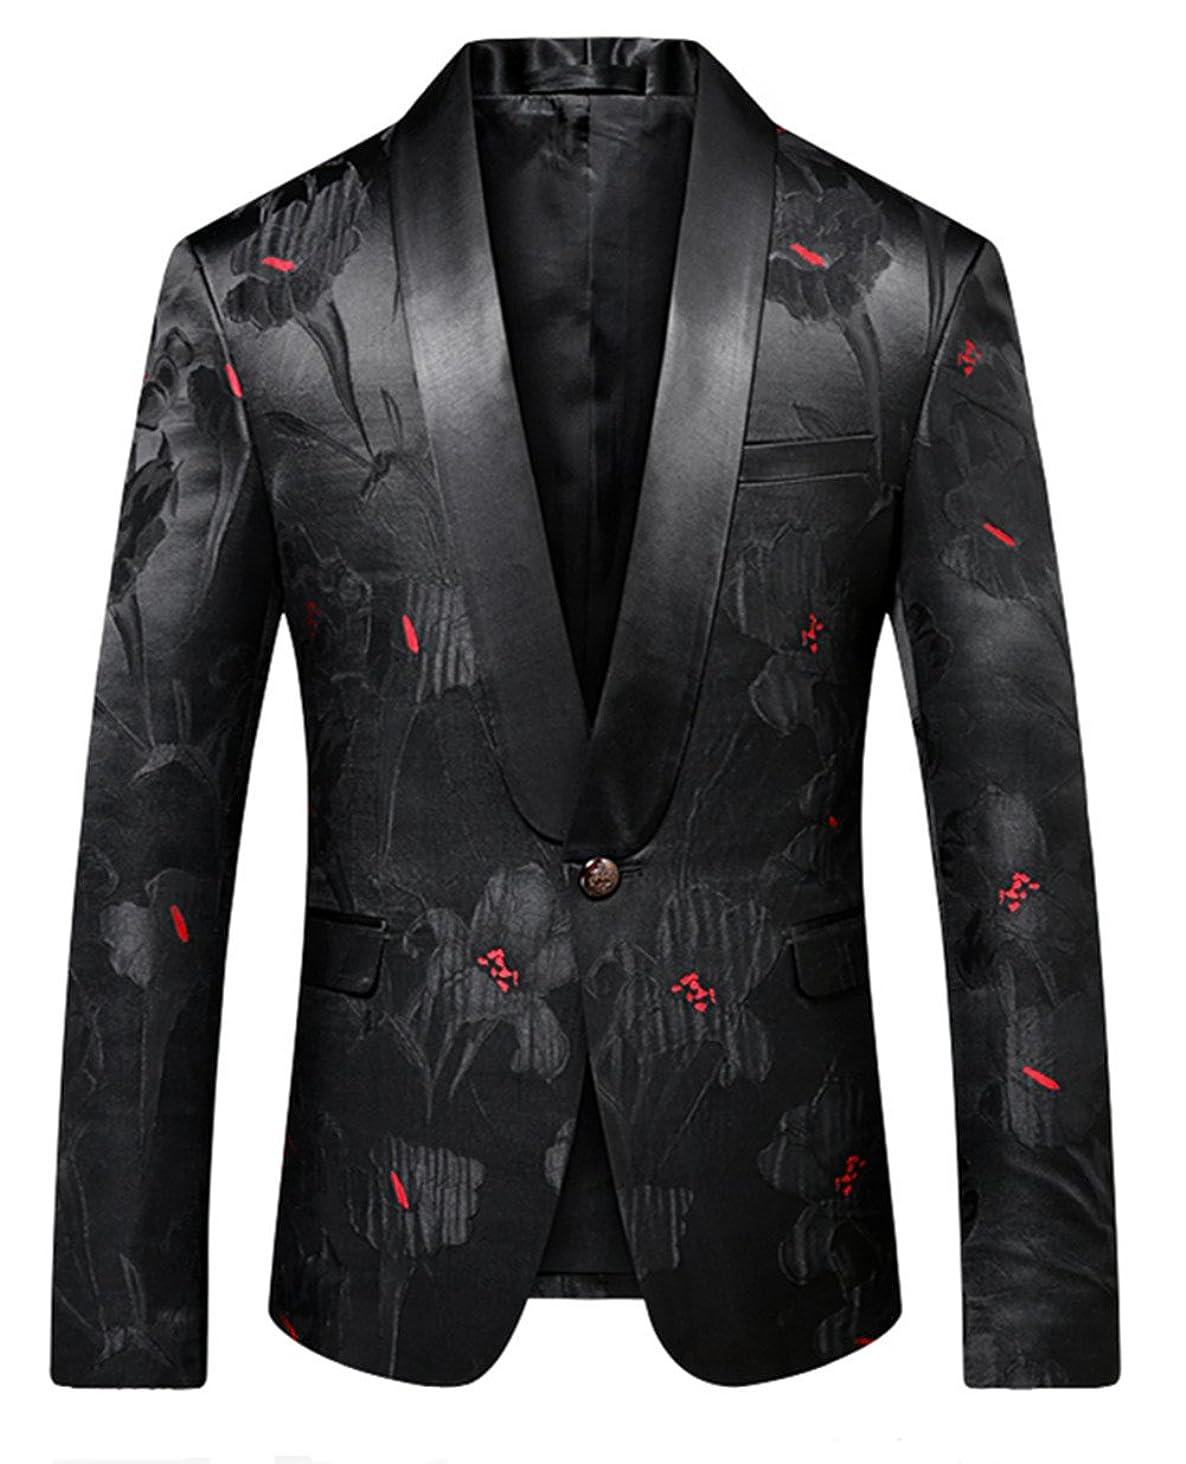 MOGU Men Slim Fit Blazer Suit Jacket Black Printed Jacquard Sport Coat